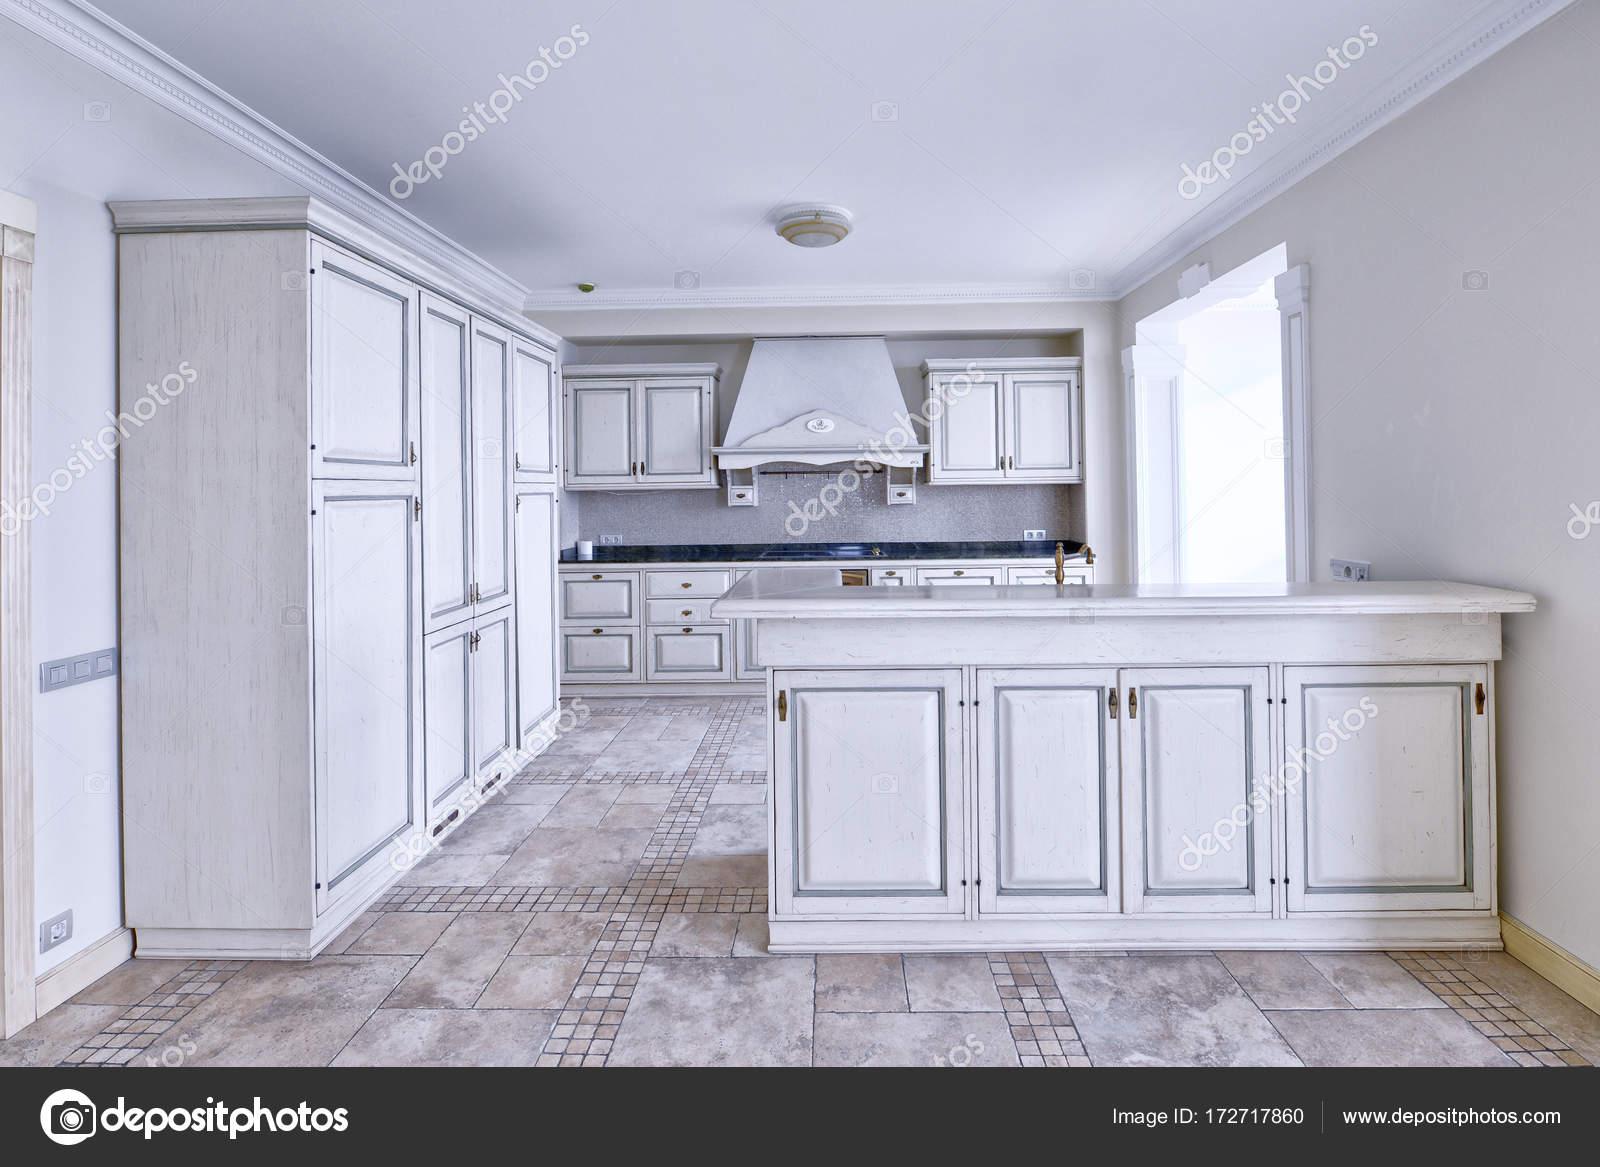 cocina, comedor, estufa, refrigerador, horno, platos, sillas, bar ...